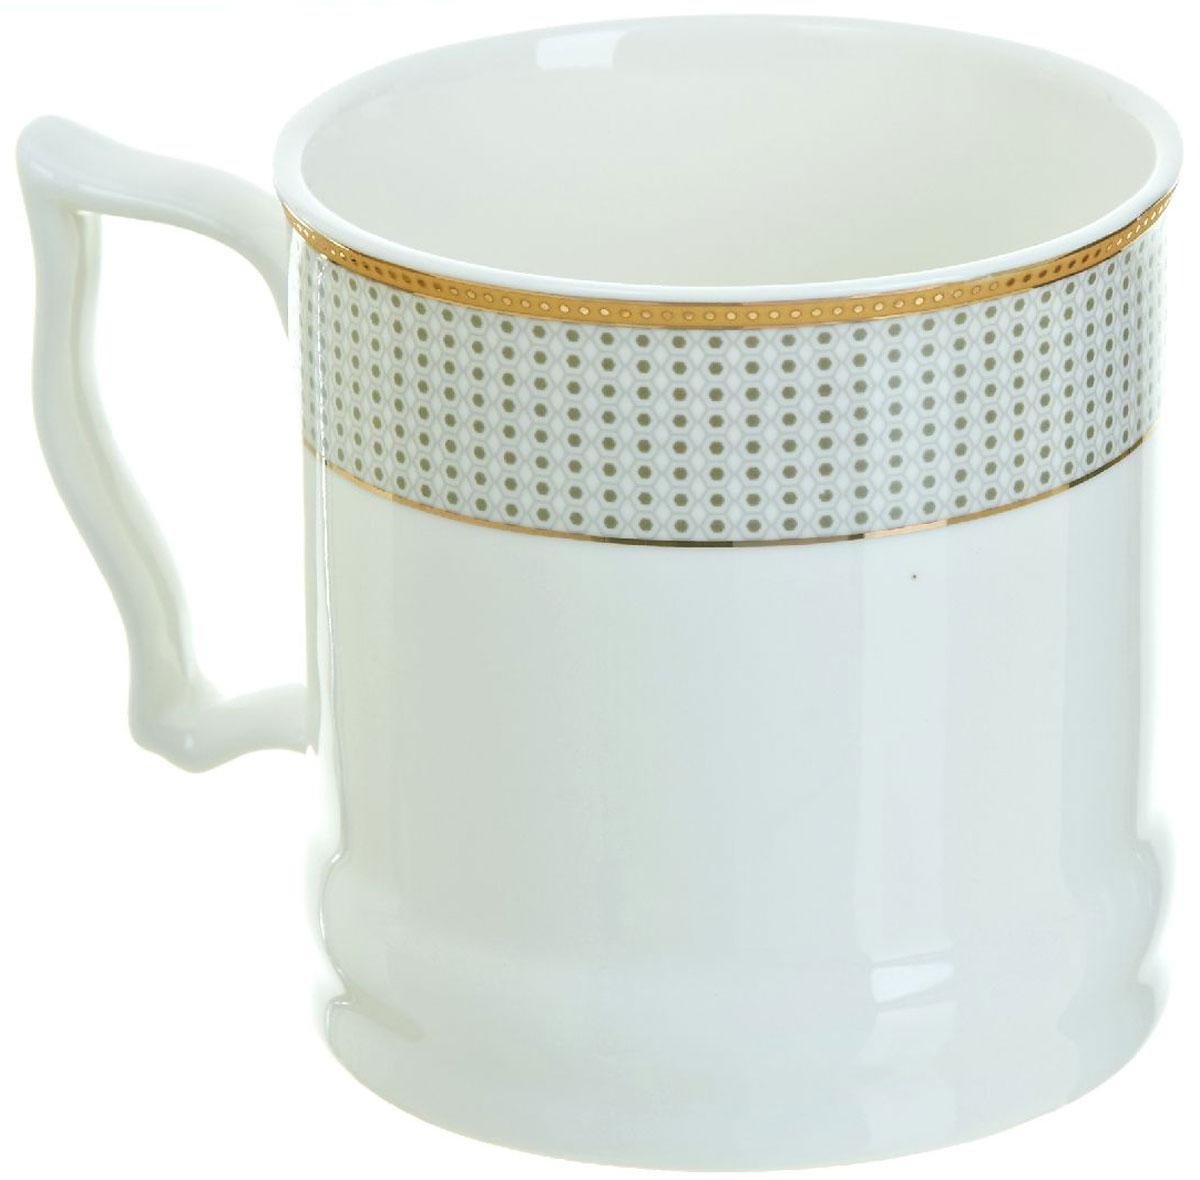 Кружка BHP Королевская кружка, 500 мл. 1870012 кружка amber porcelain сердечки 220 мл